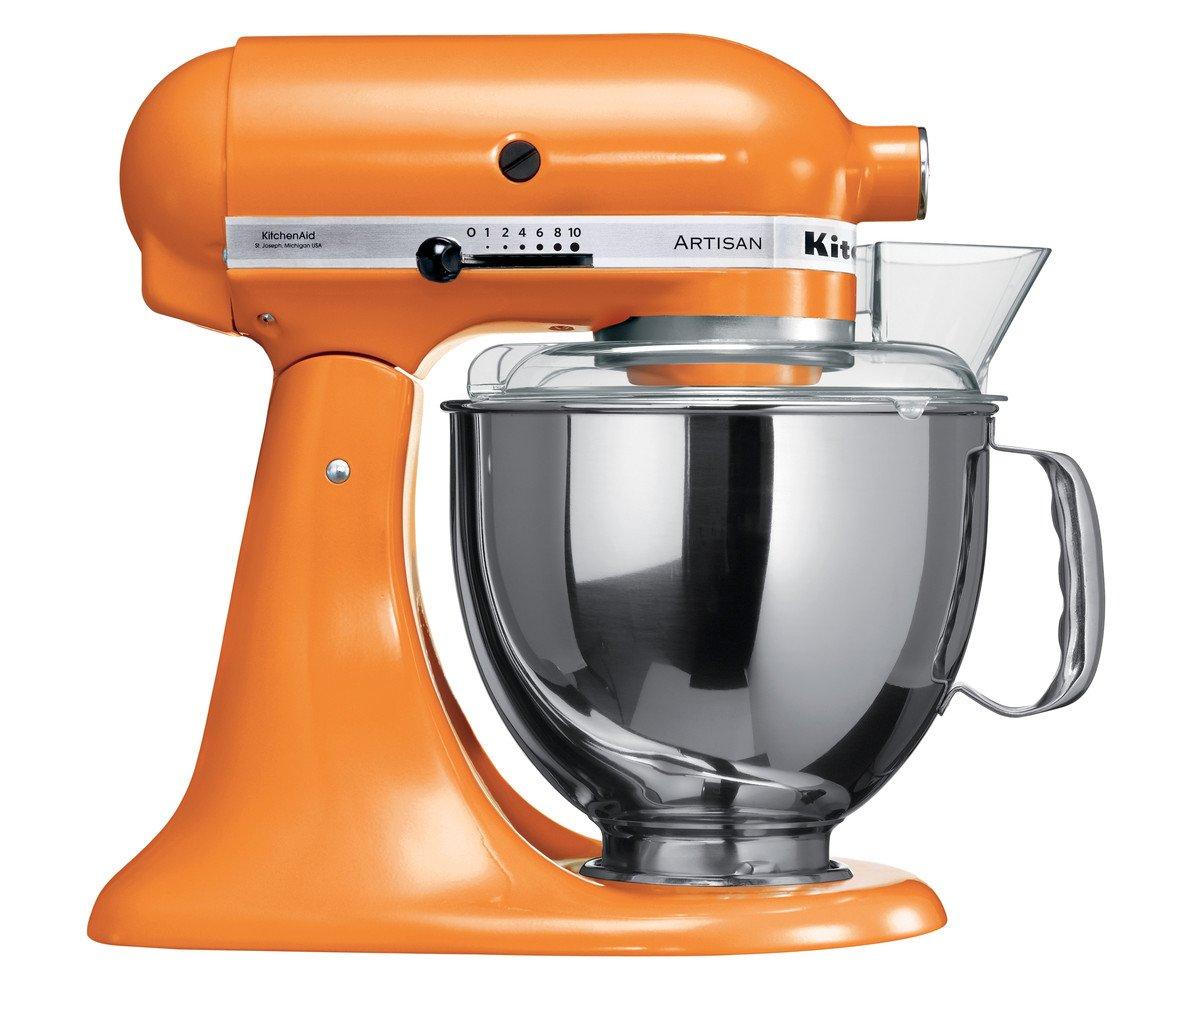 Buy Kitchenaid Artisan 5ksm150psdtg 300 Watt Tilt Head Stand Mixer Ariston An 15rs 350 Water Heather With Flat Beater Dough Hook Whisk Stainless Steel Bowl Pouring Shield Tangerine